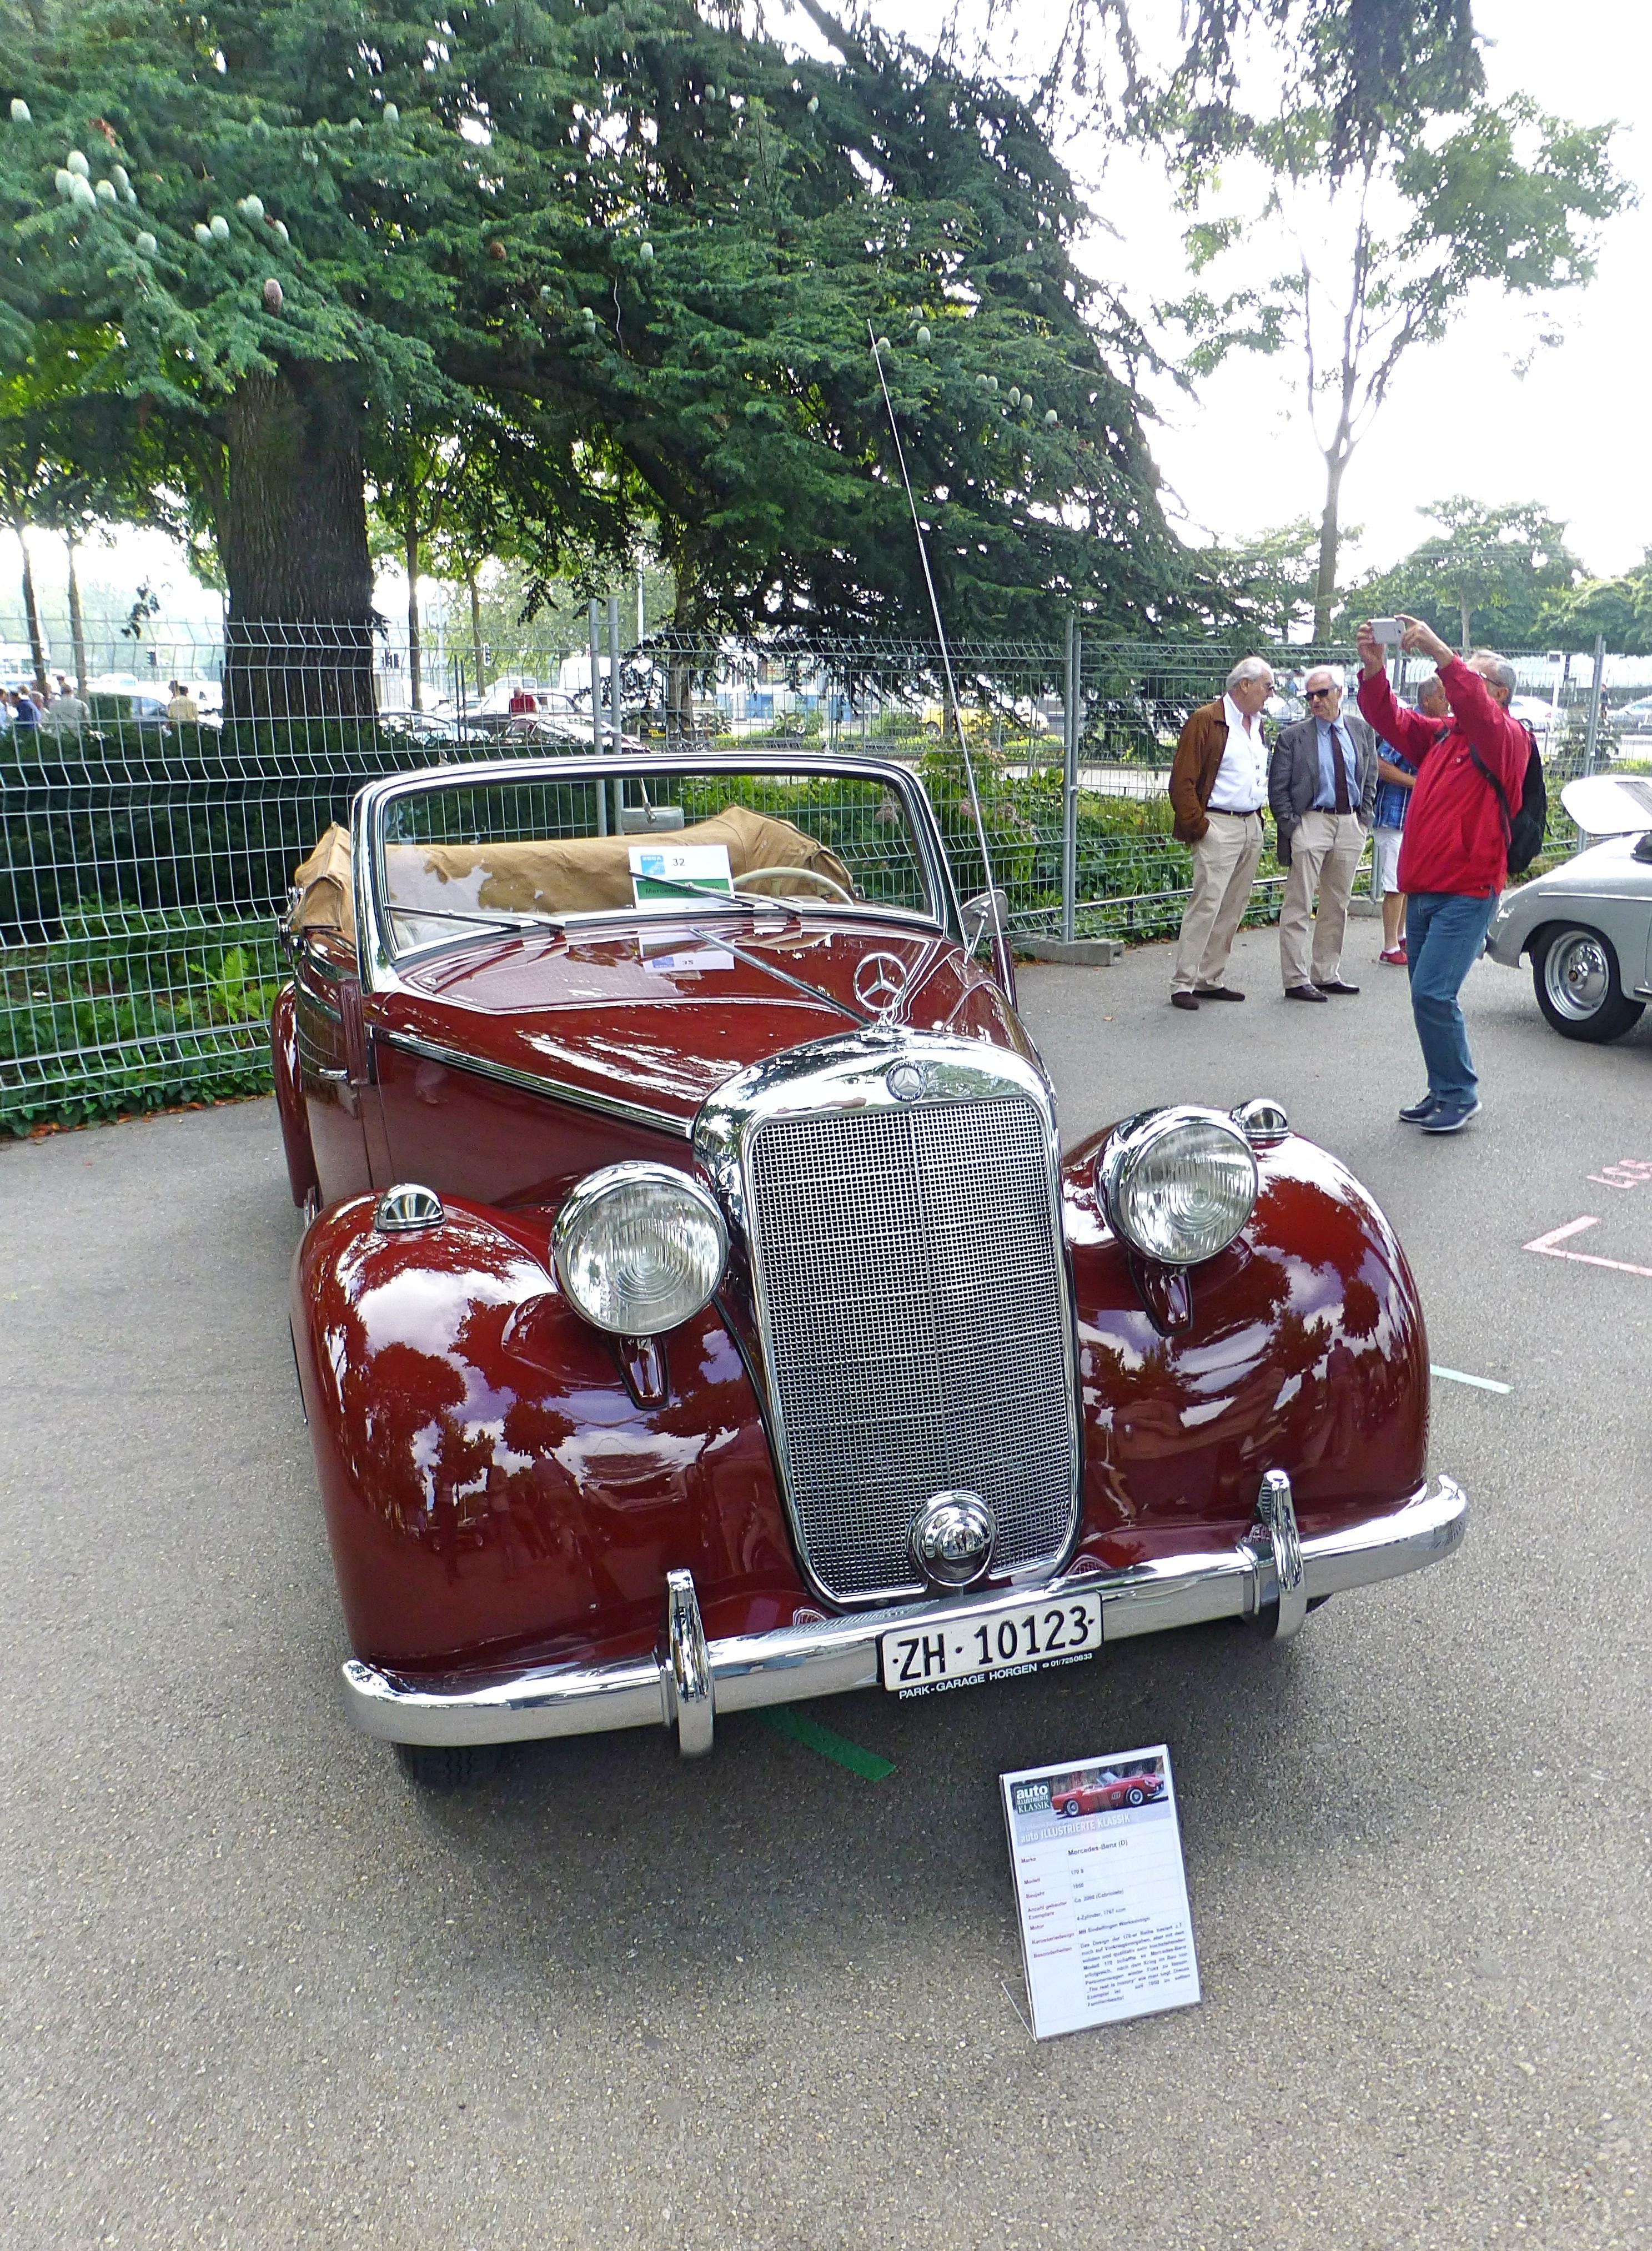 Zurich Classic Car Award 2013 (2)